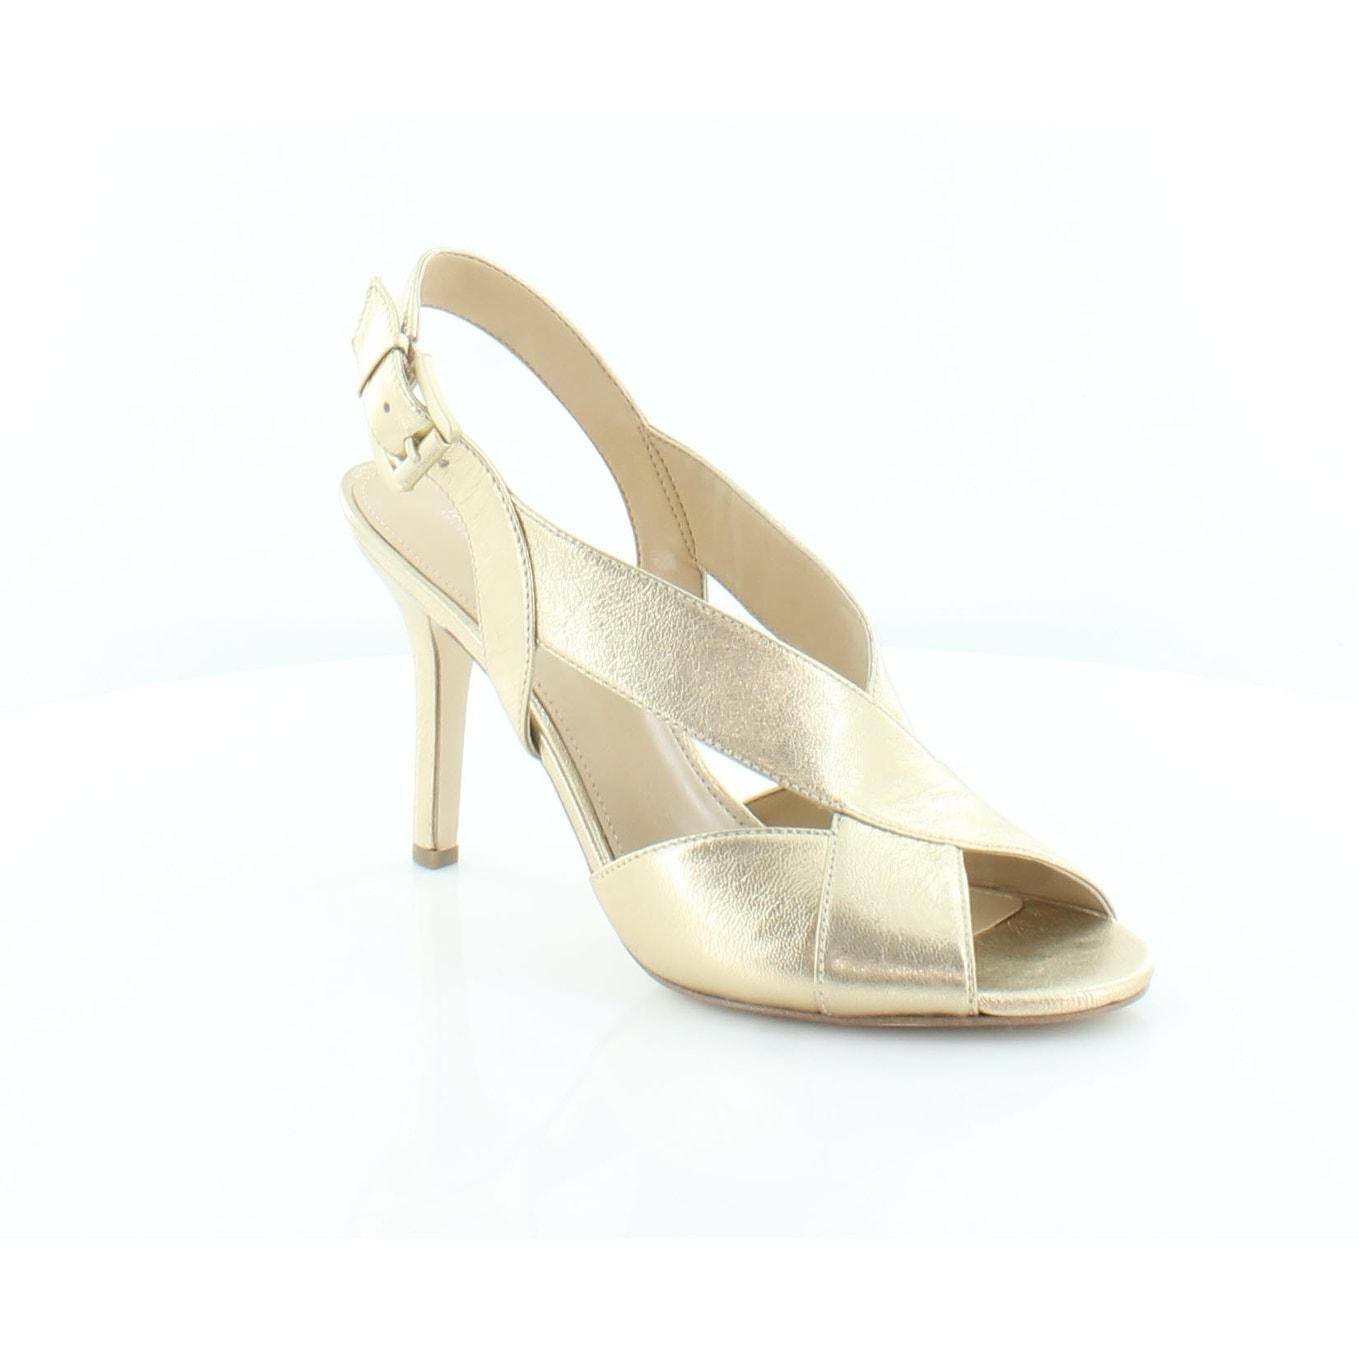 356e87e655bf Shop Michael Kors Becky Sandal Women s Heels Pale Gold - Free ...